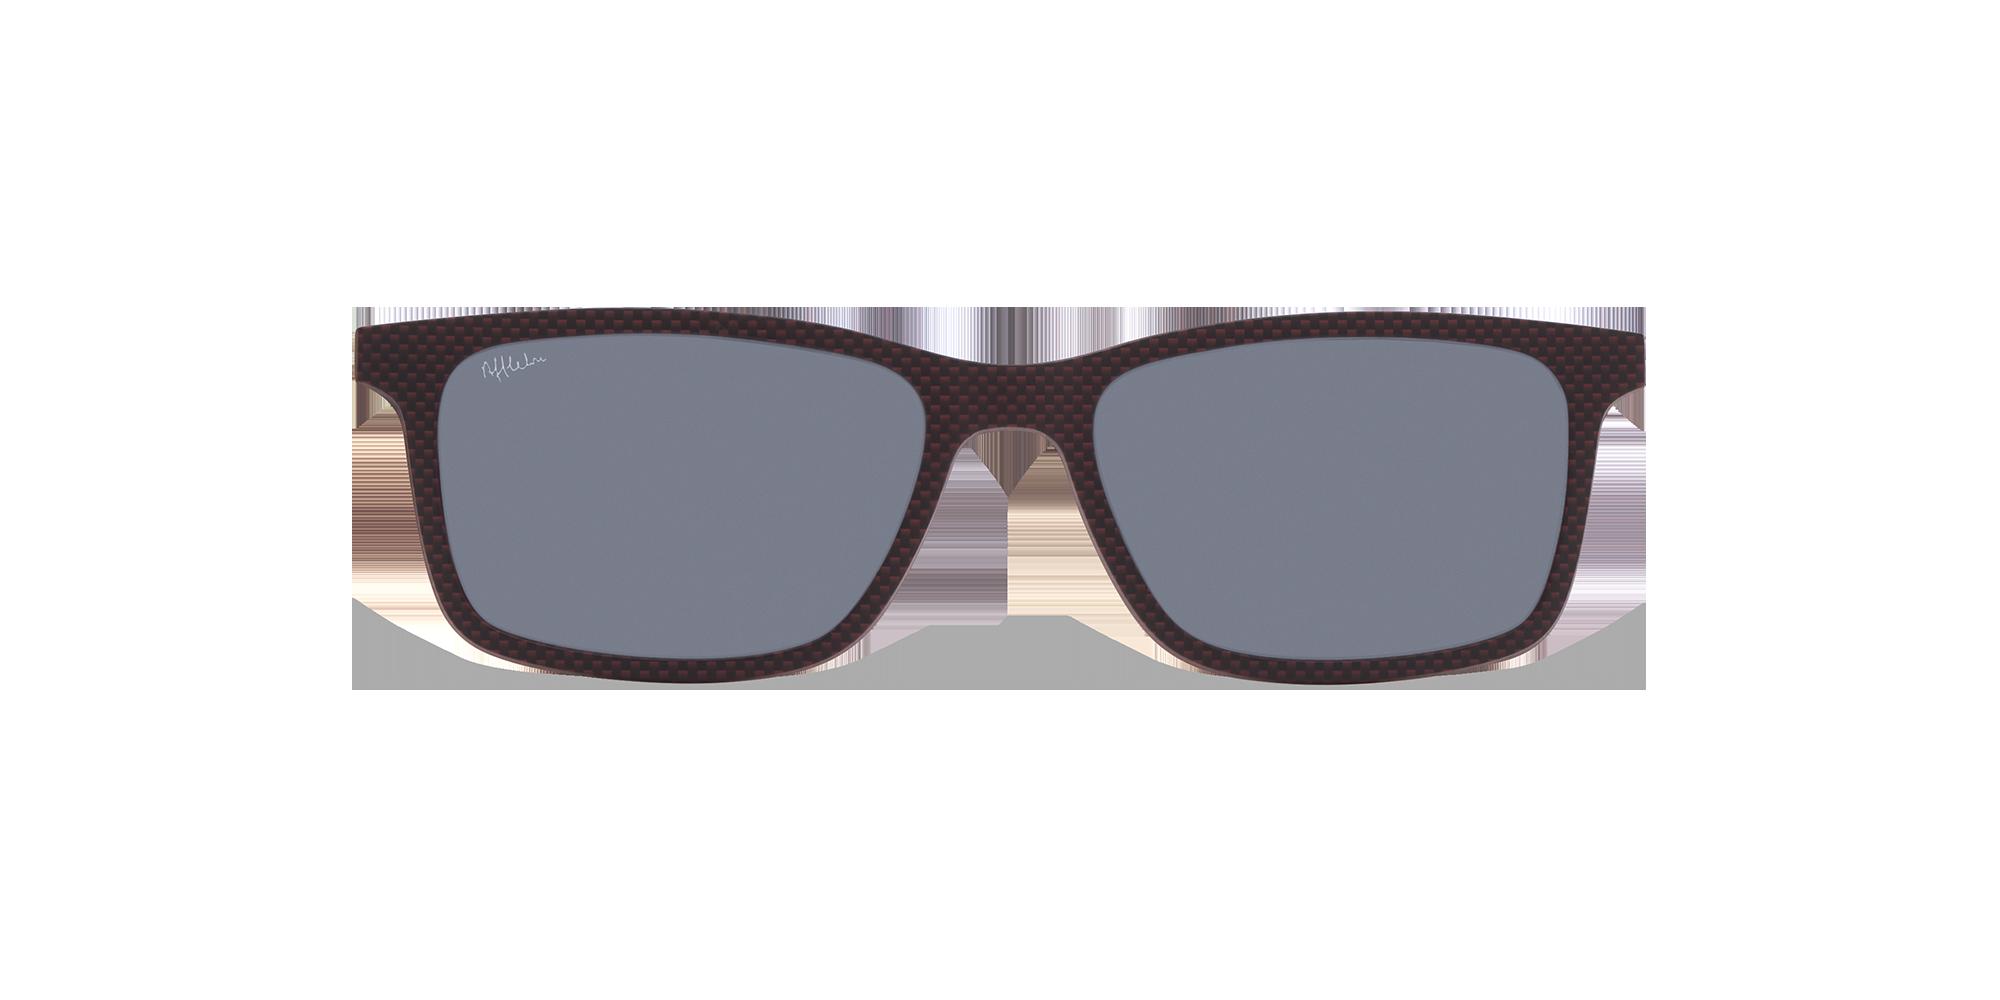 afflelou/france/products/smart_clip/clips_glasses/TMK32SURD015316.png